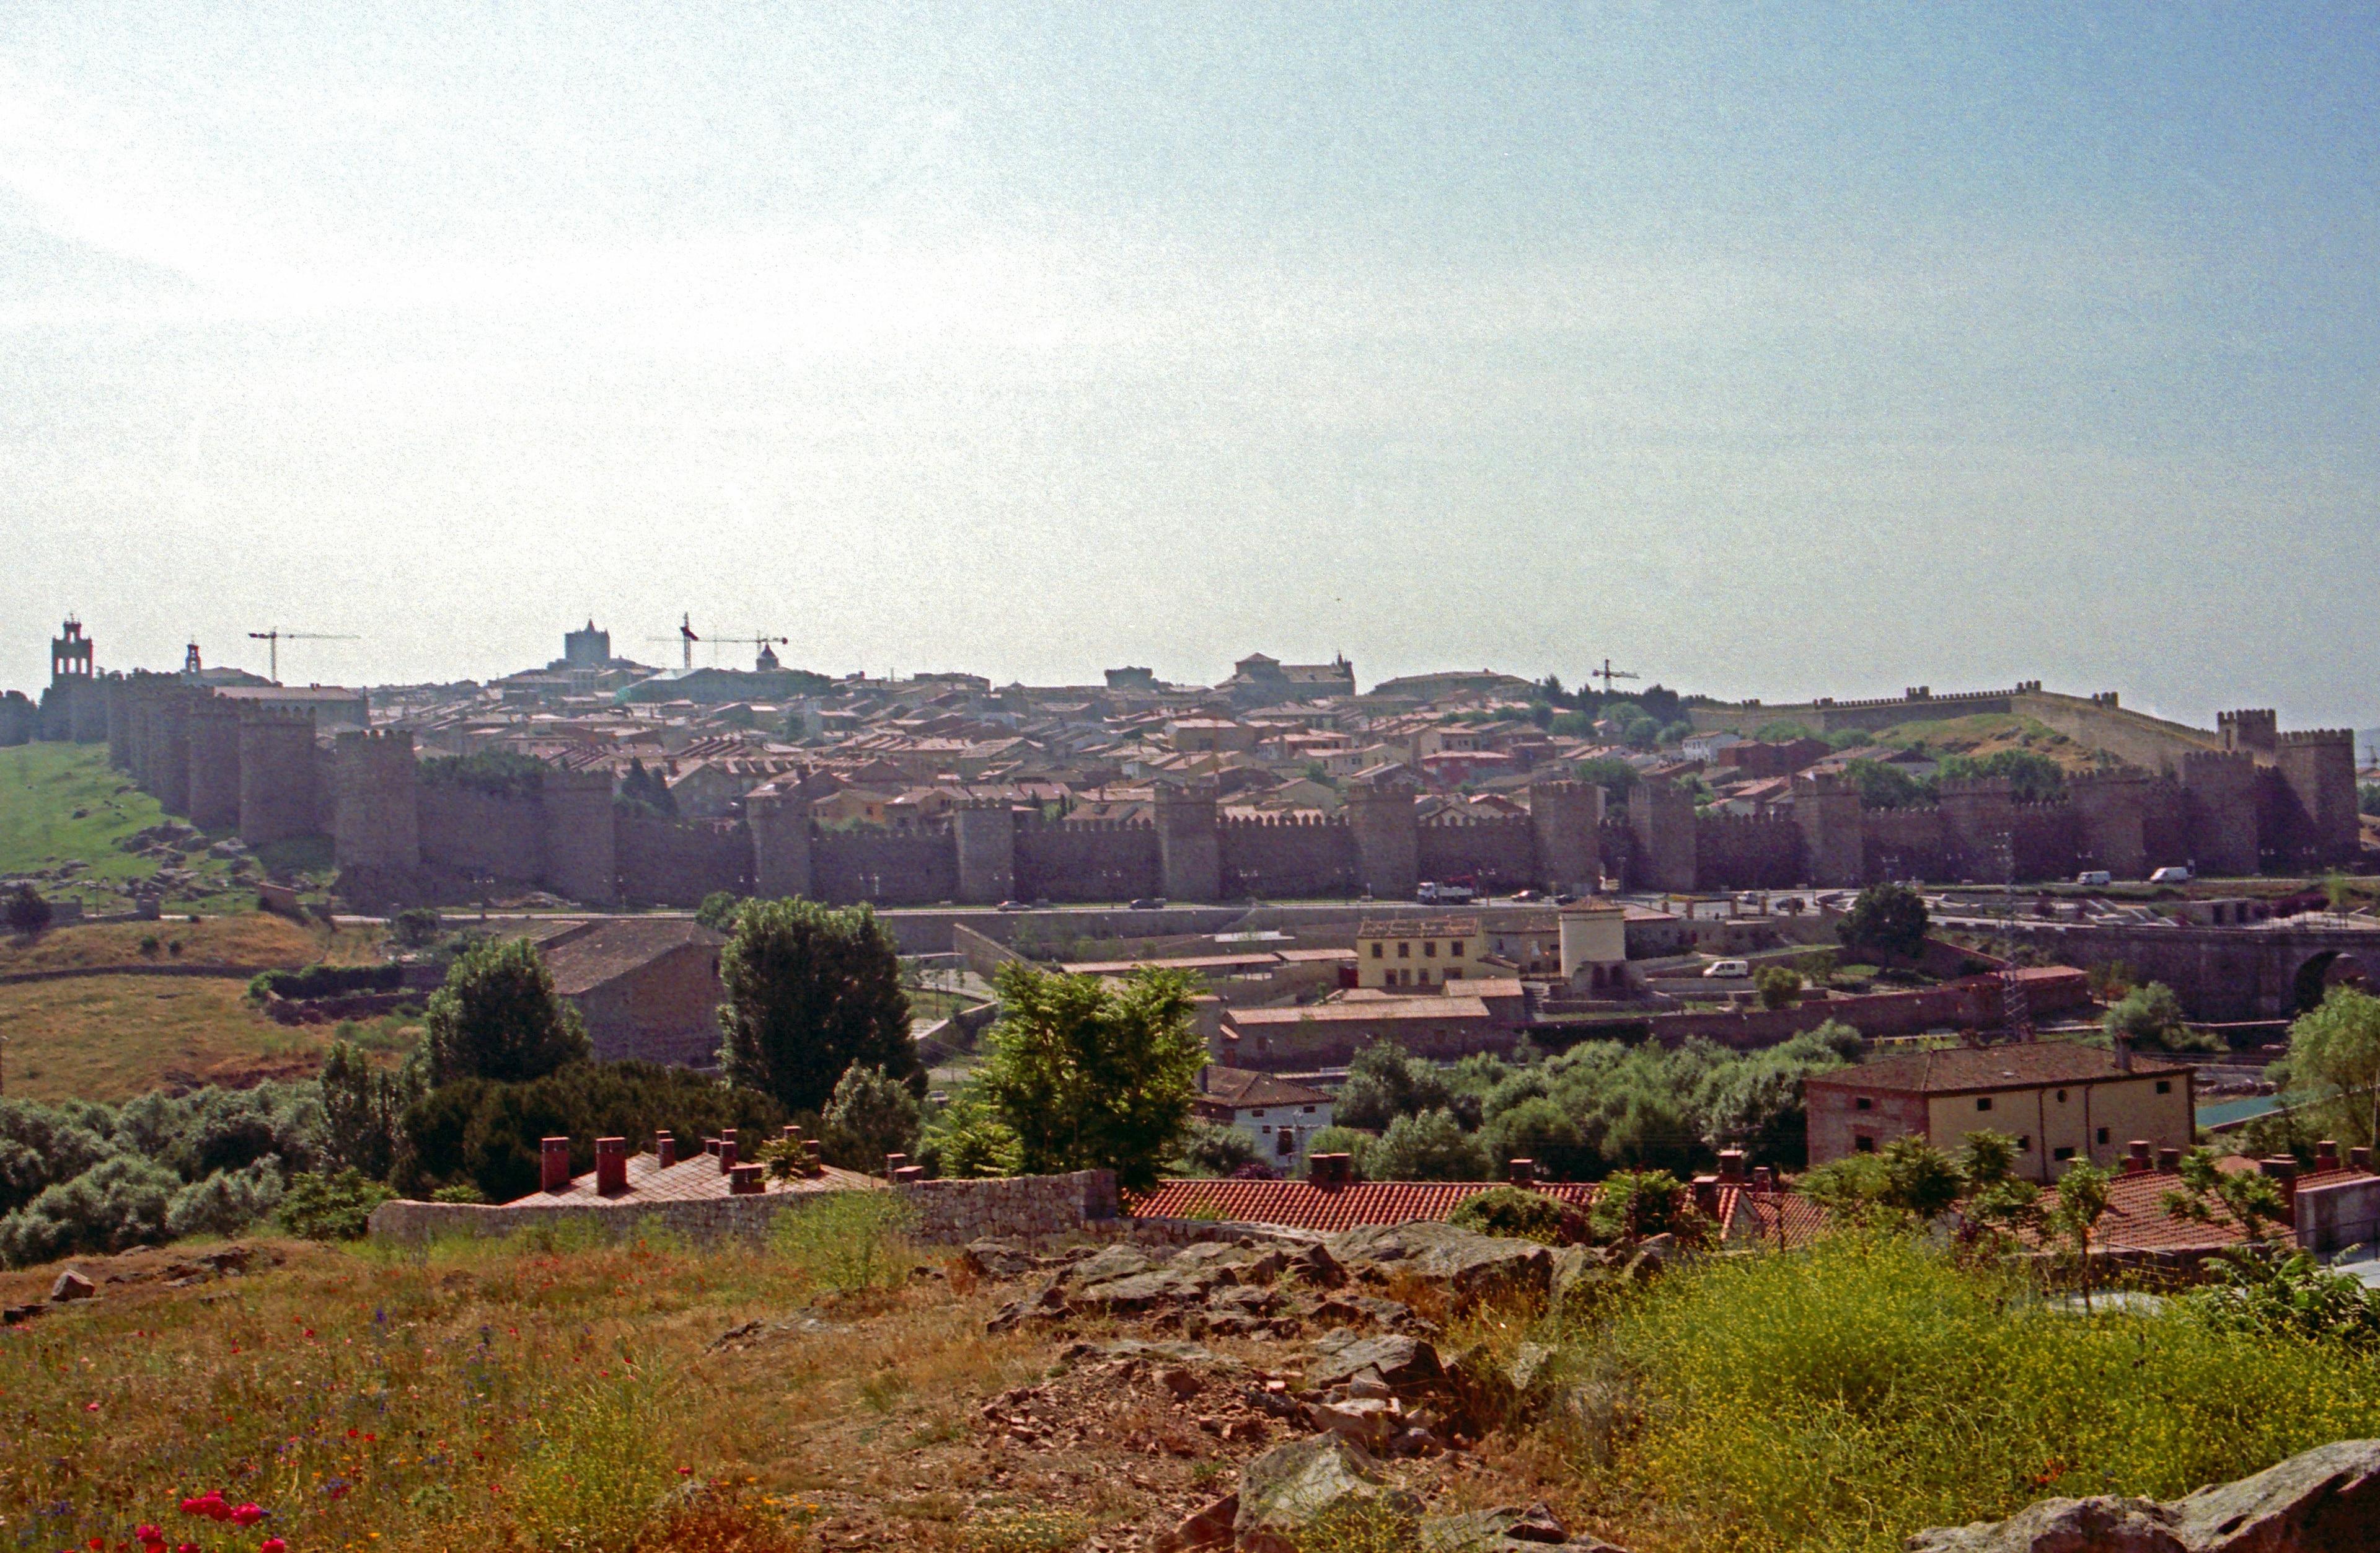 Narrillos de San Leonardo, Avila, Castile and Leon, Spain